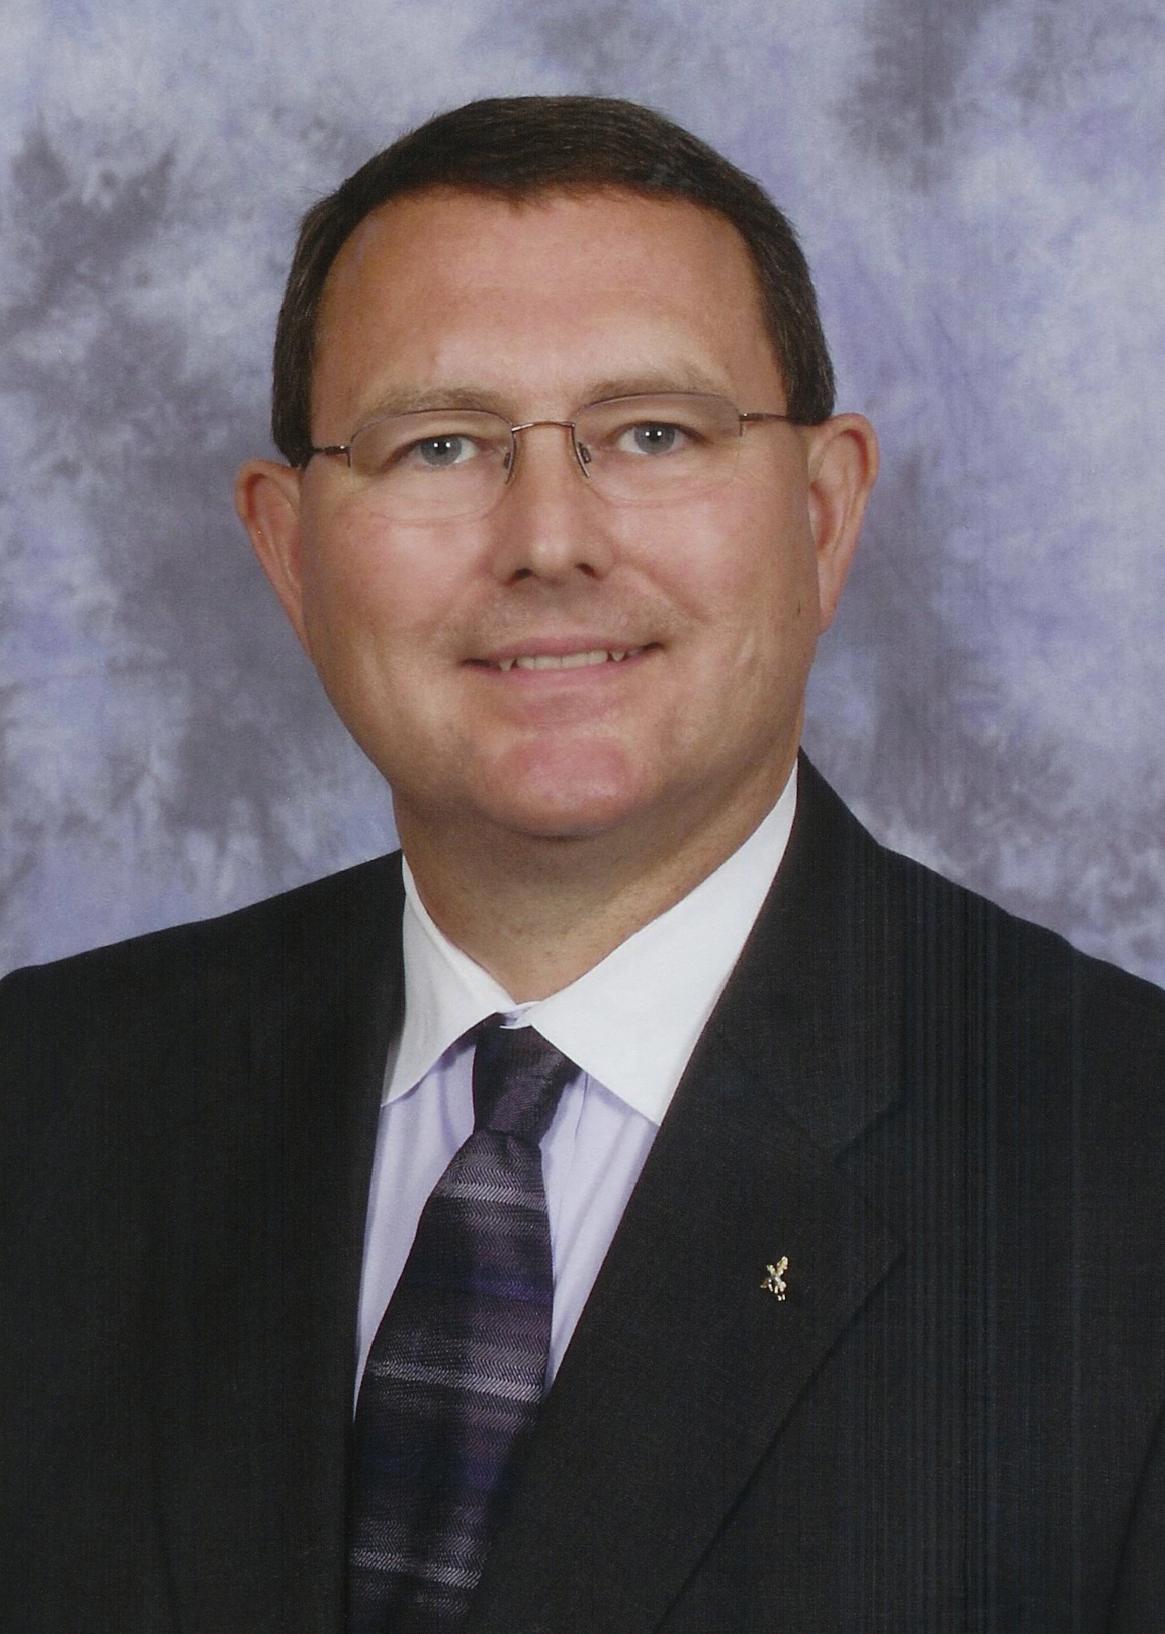 head shot photo of Clyde Hewitt